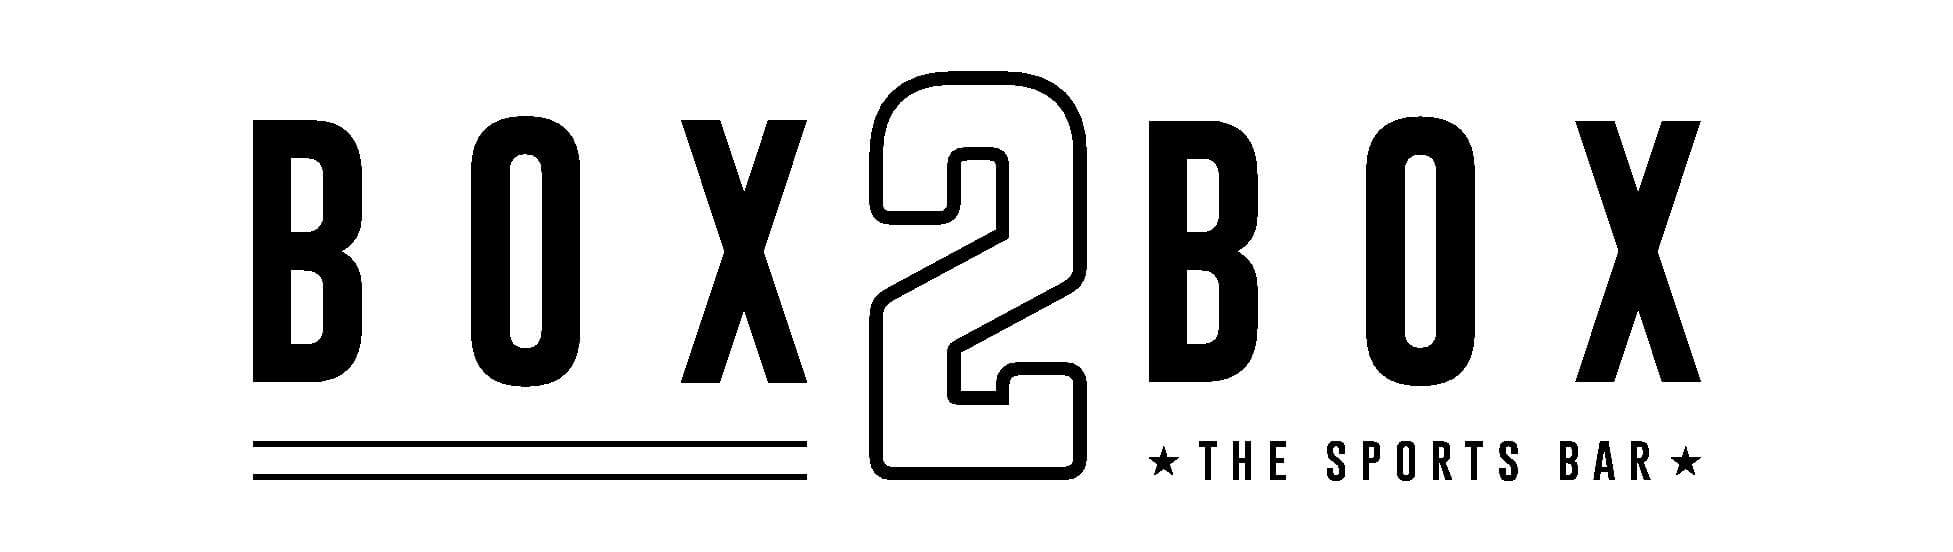 logo box2box